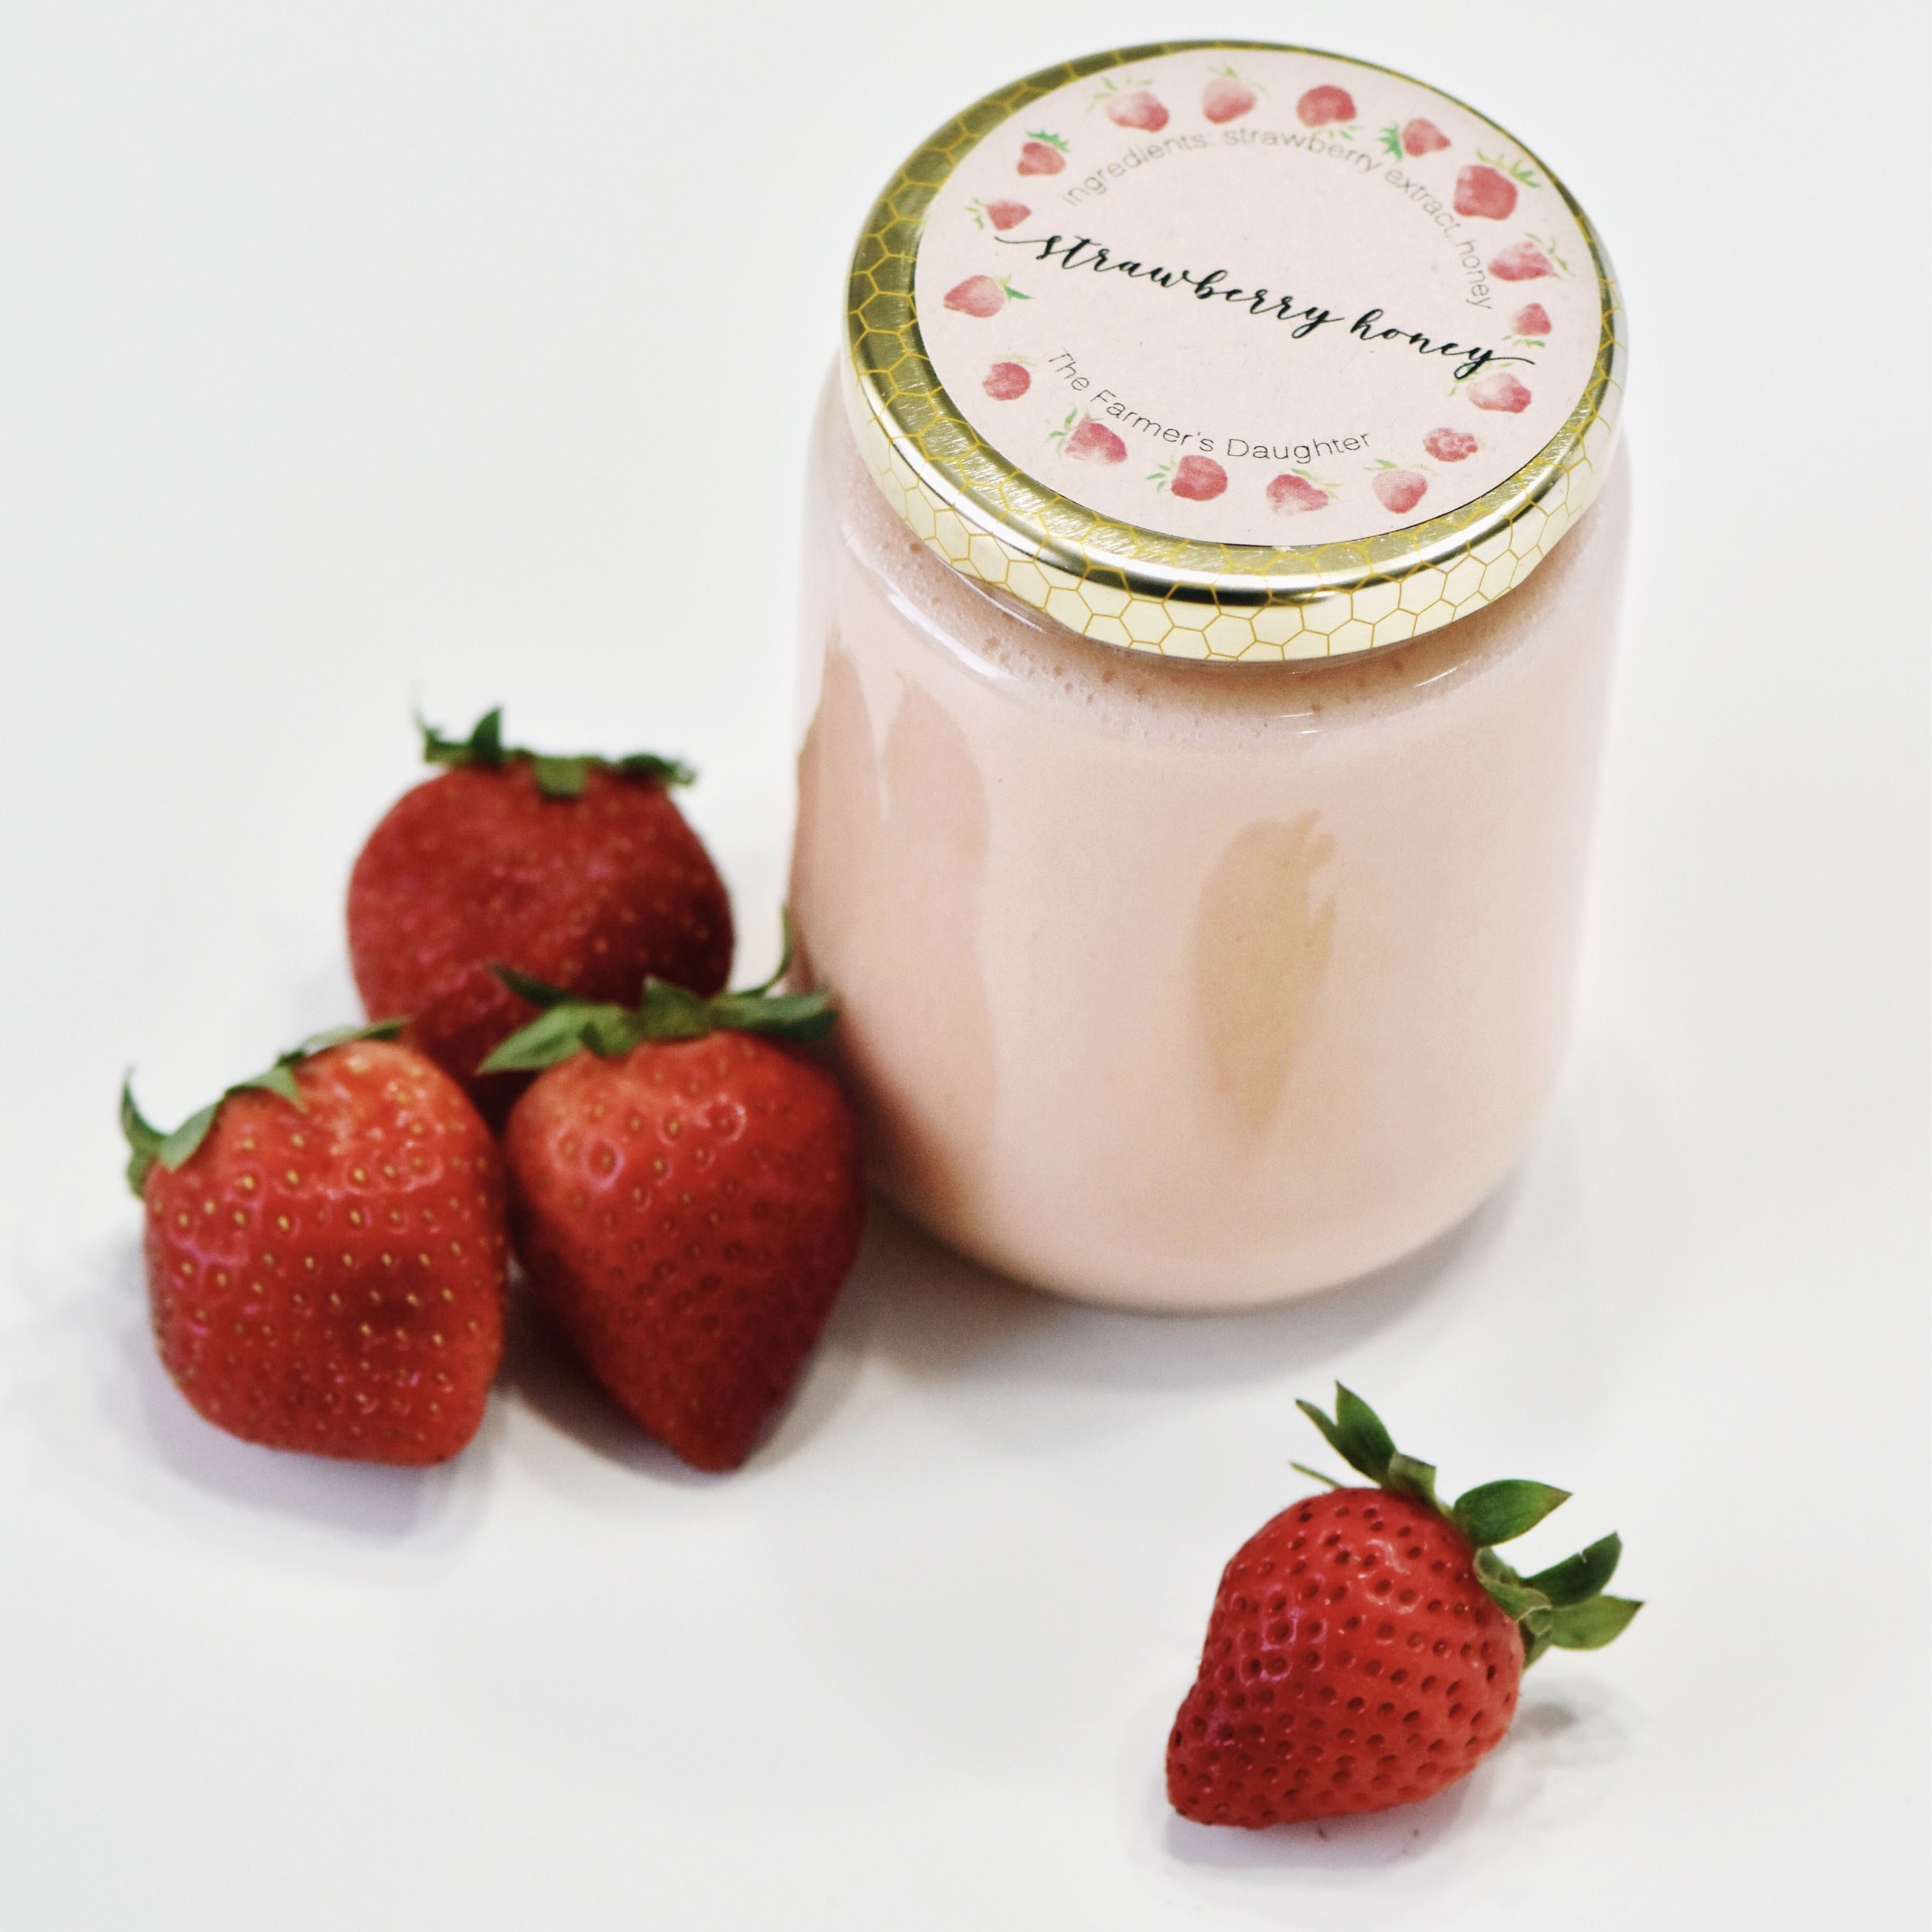 - Strawberry